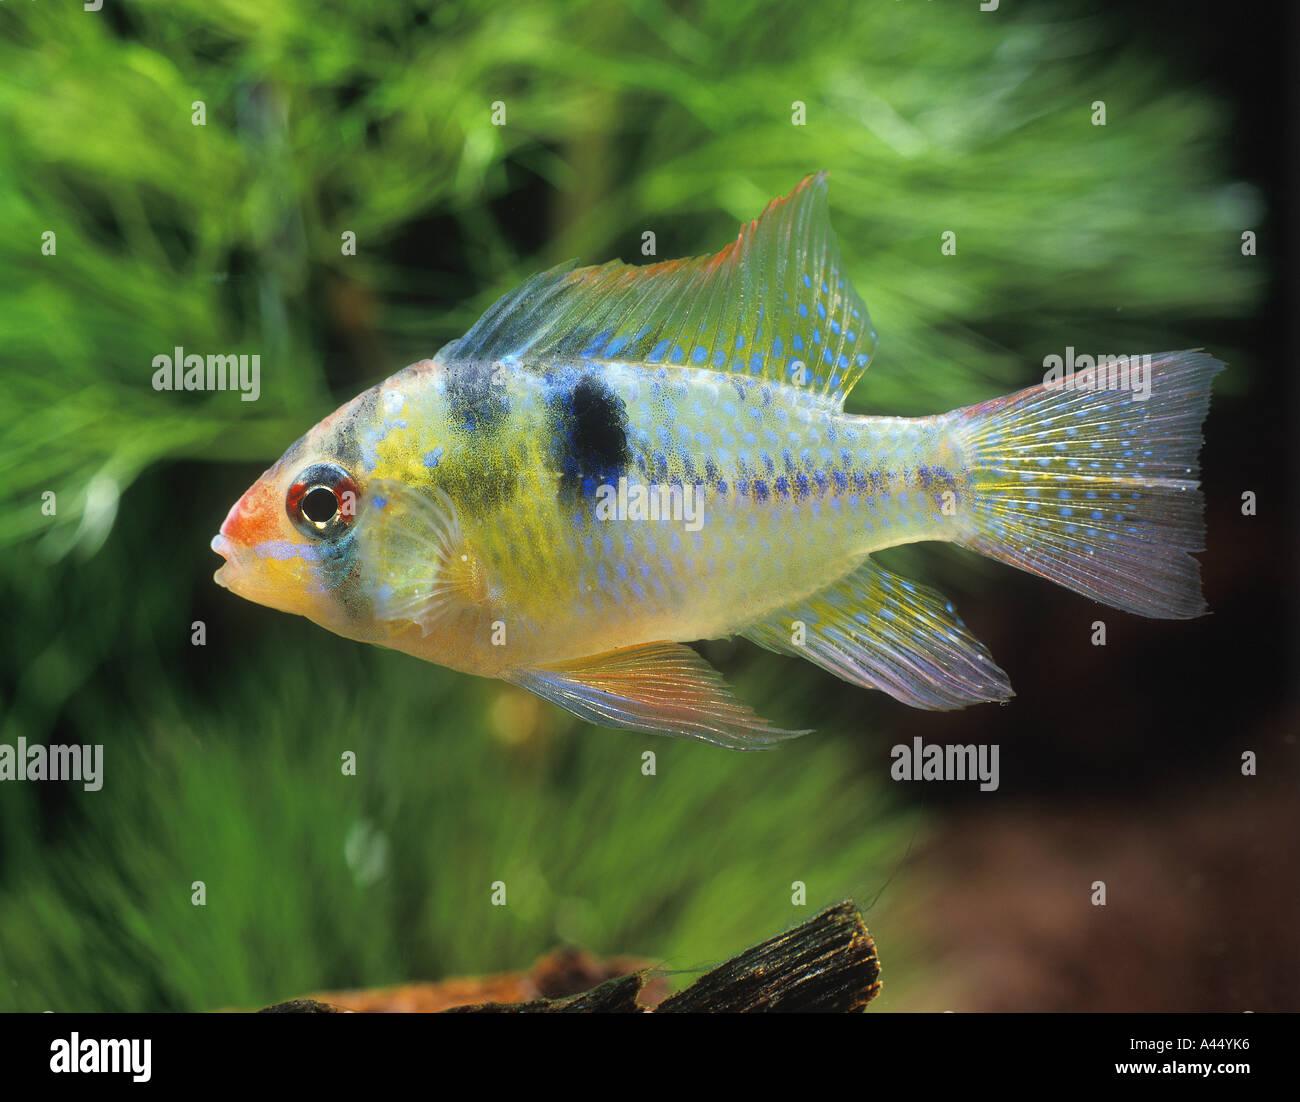 Freshwater fish hobby - Fish Ramirezi Dwarf Cichlid Apistograma Ramirezi South America Water Aquarium Freshwater Pet Hobby Underwater Swim Stock